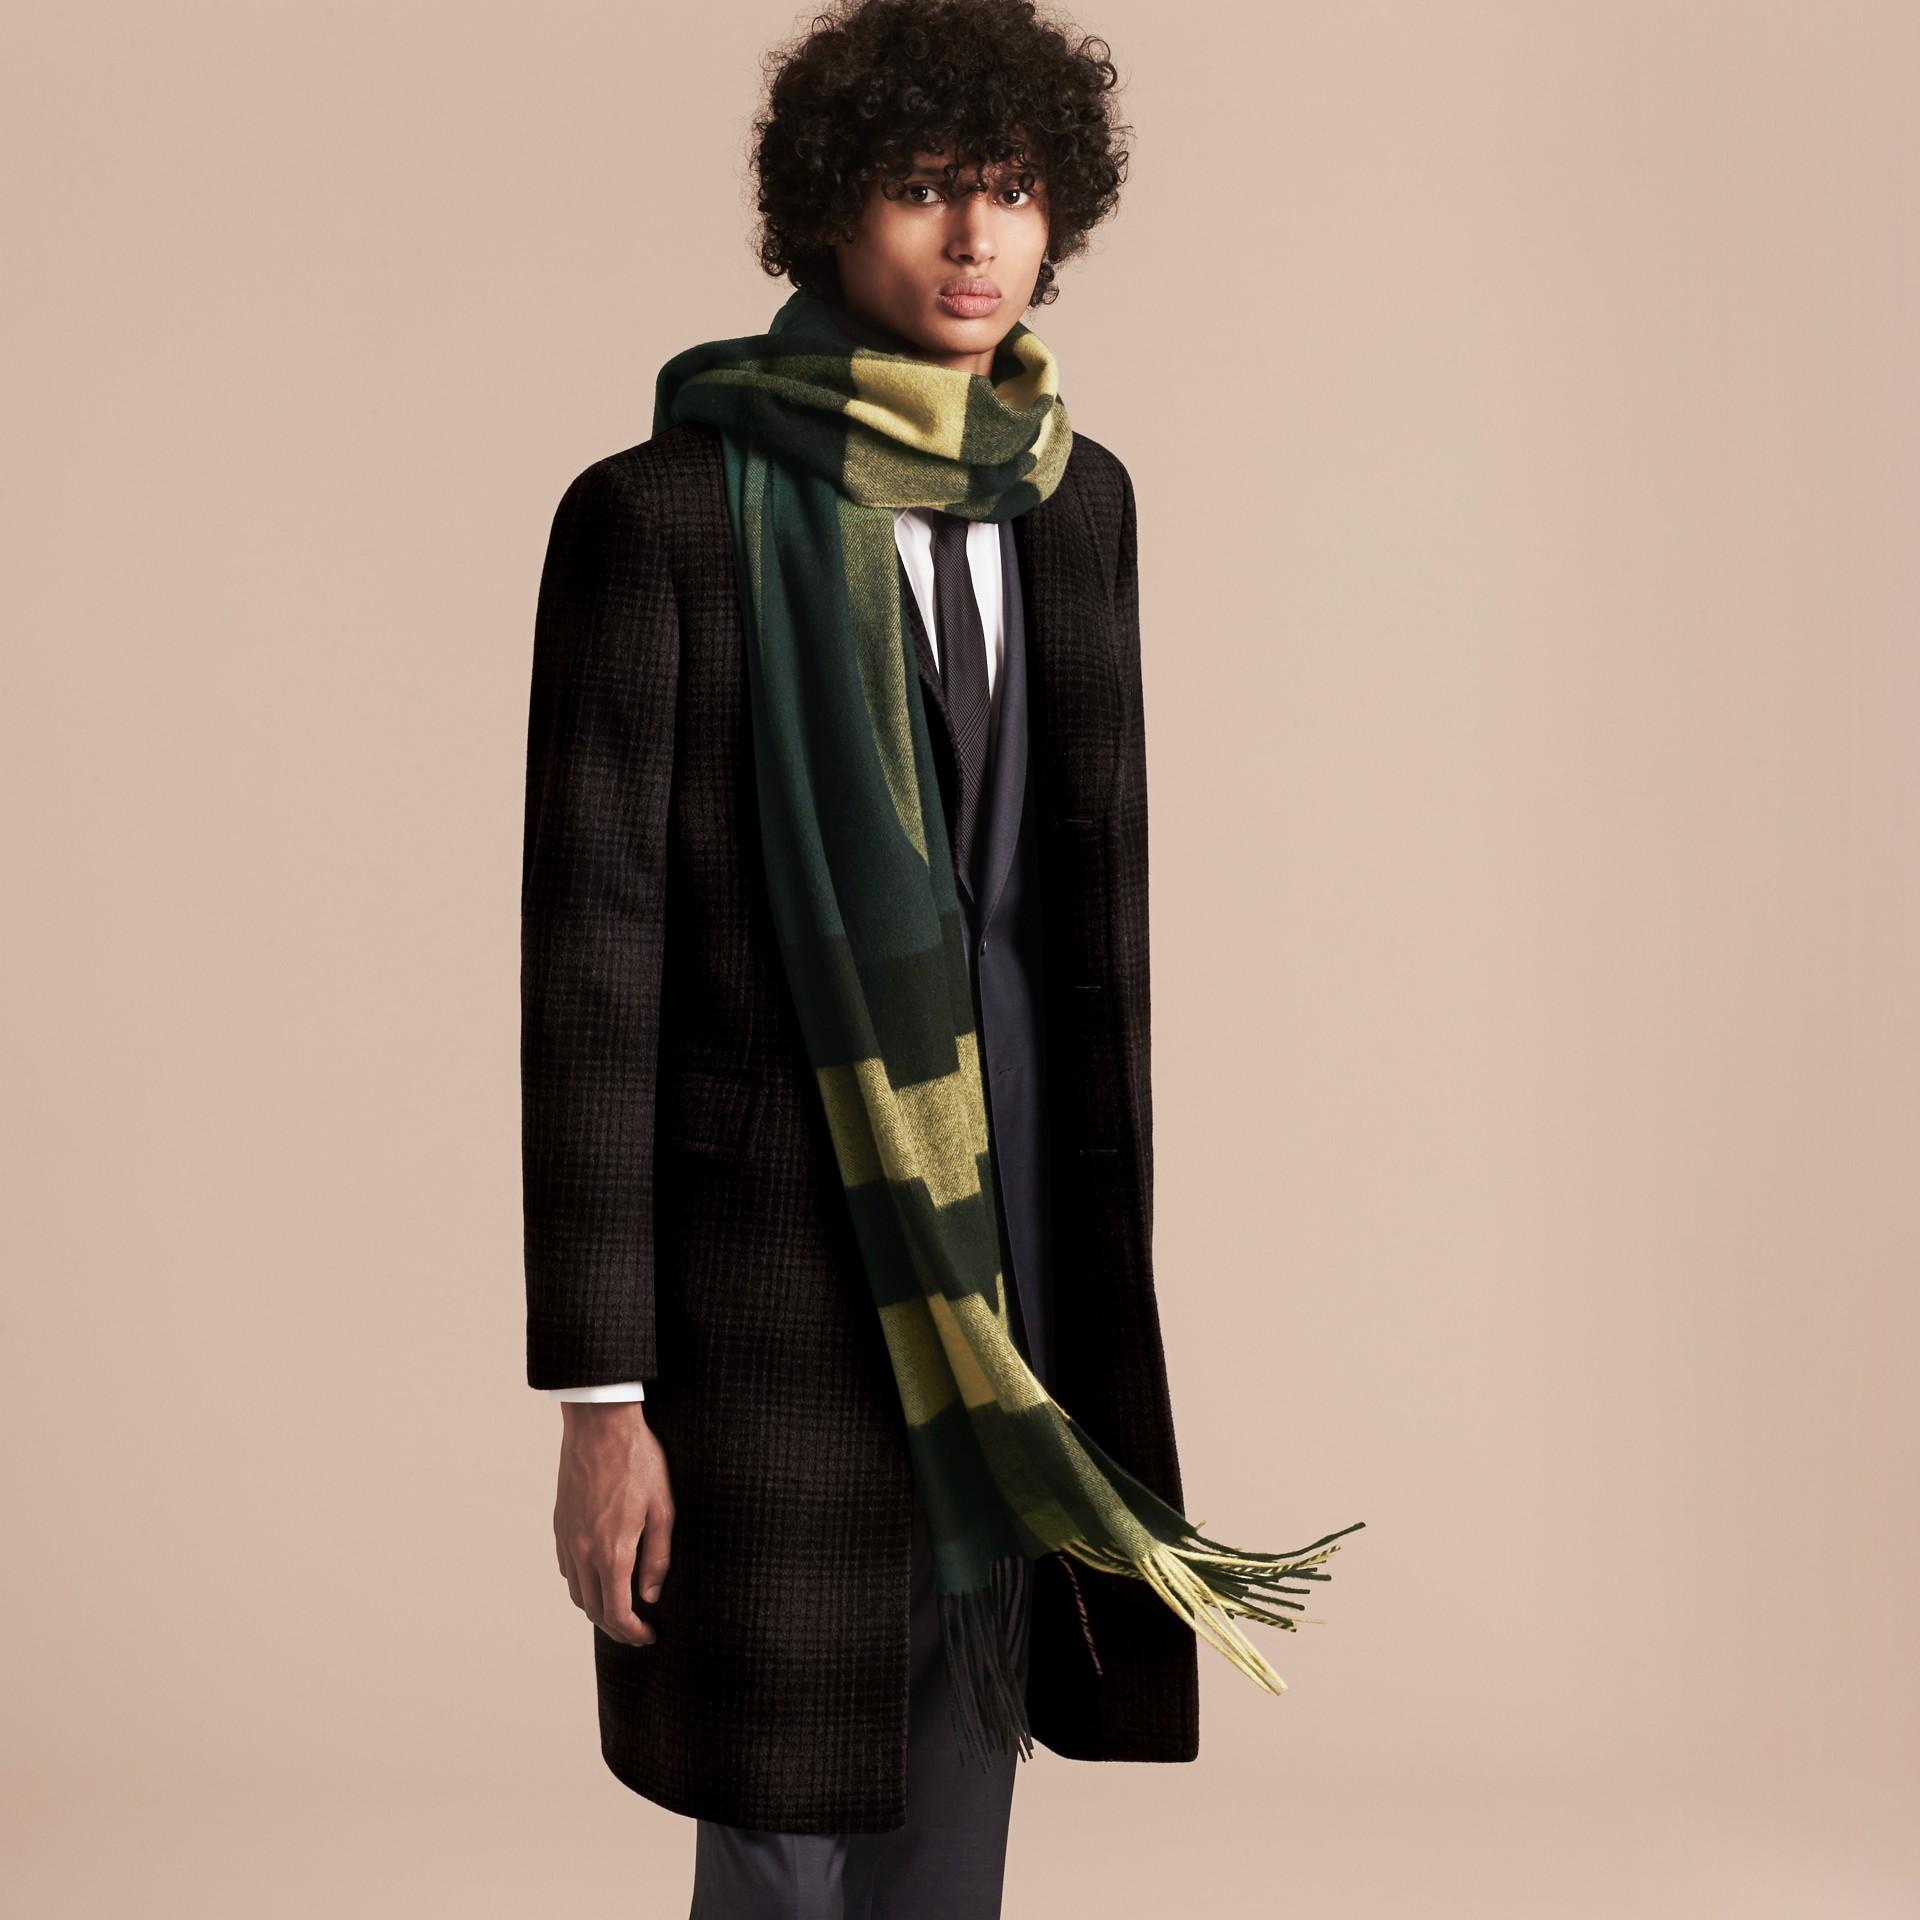 Verde oscuro/cámel Bufanda larga en cachemir de checks Verde Oscuro/cámel - imagen de la galería 3